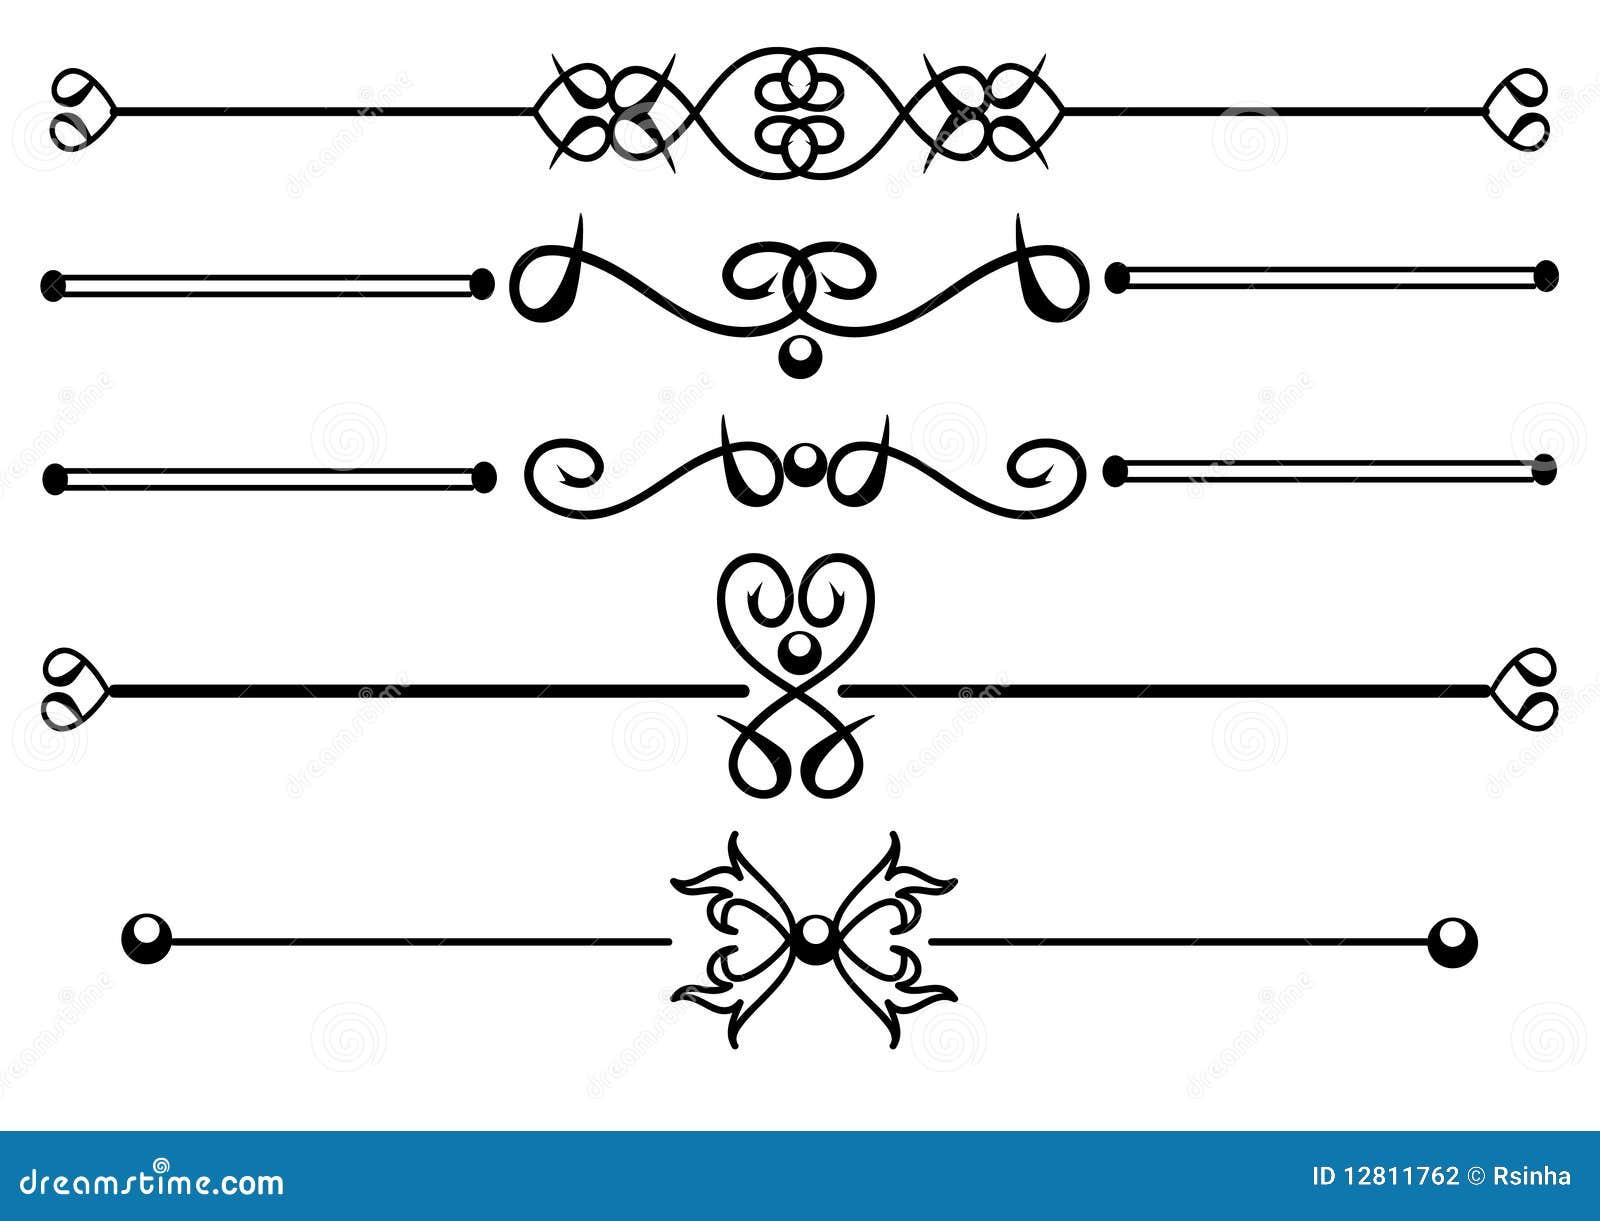 Artistic Line Design : Decorative rule lines stock vector illustration of retro